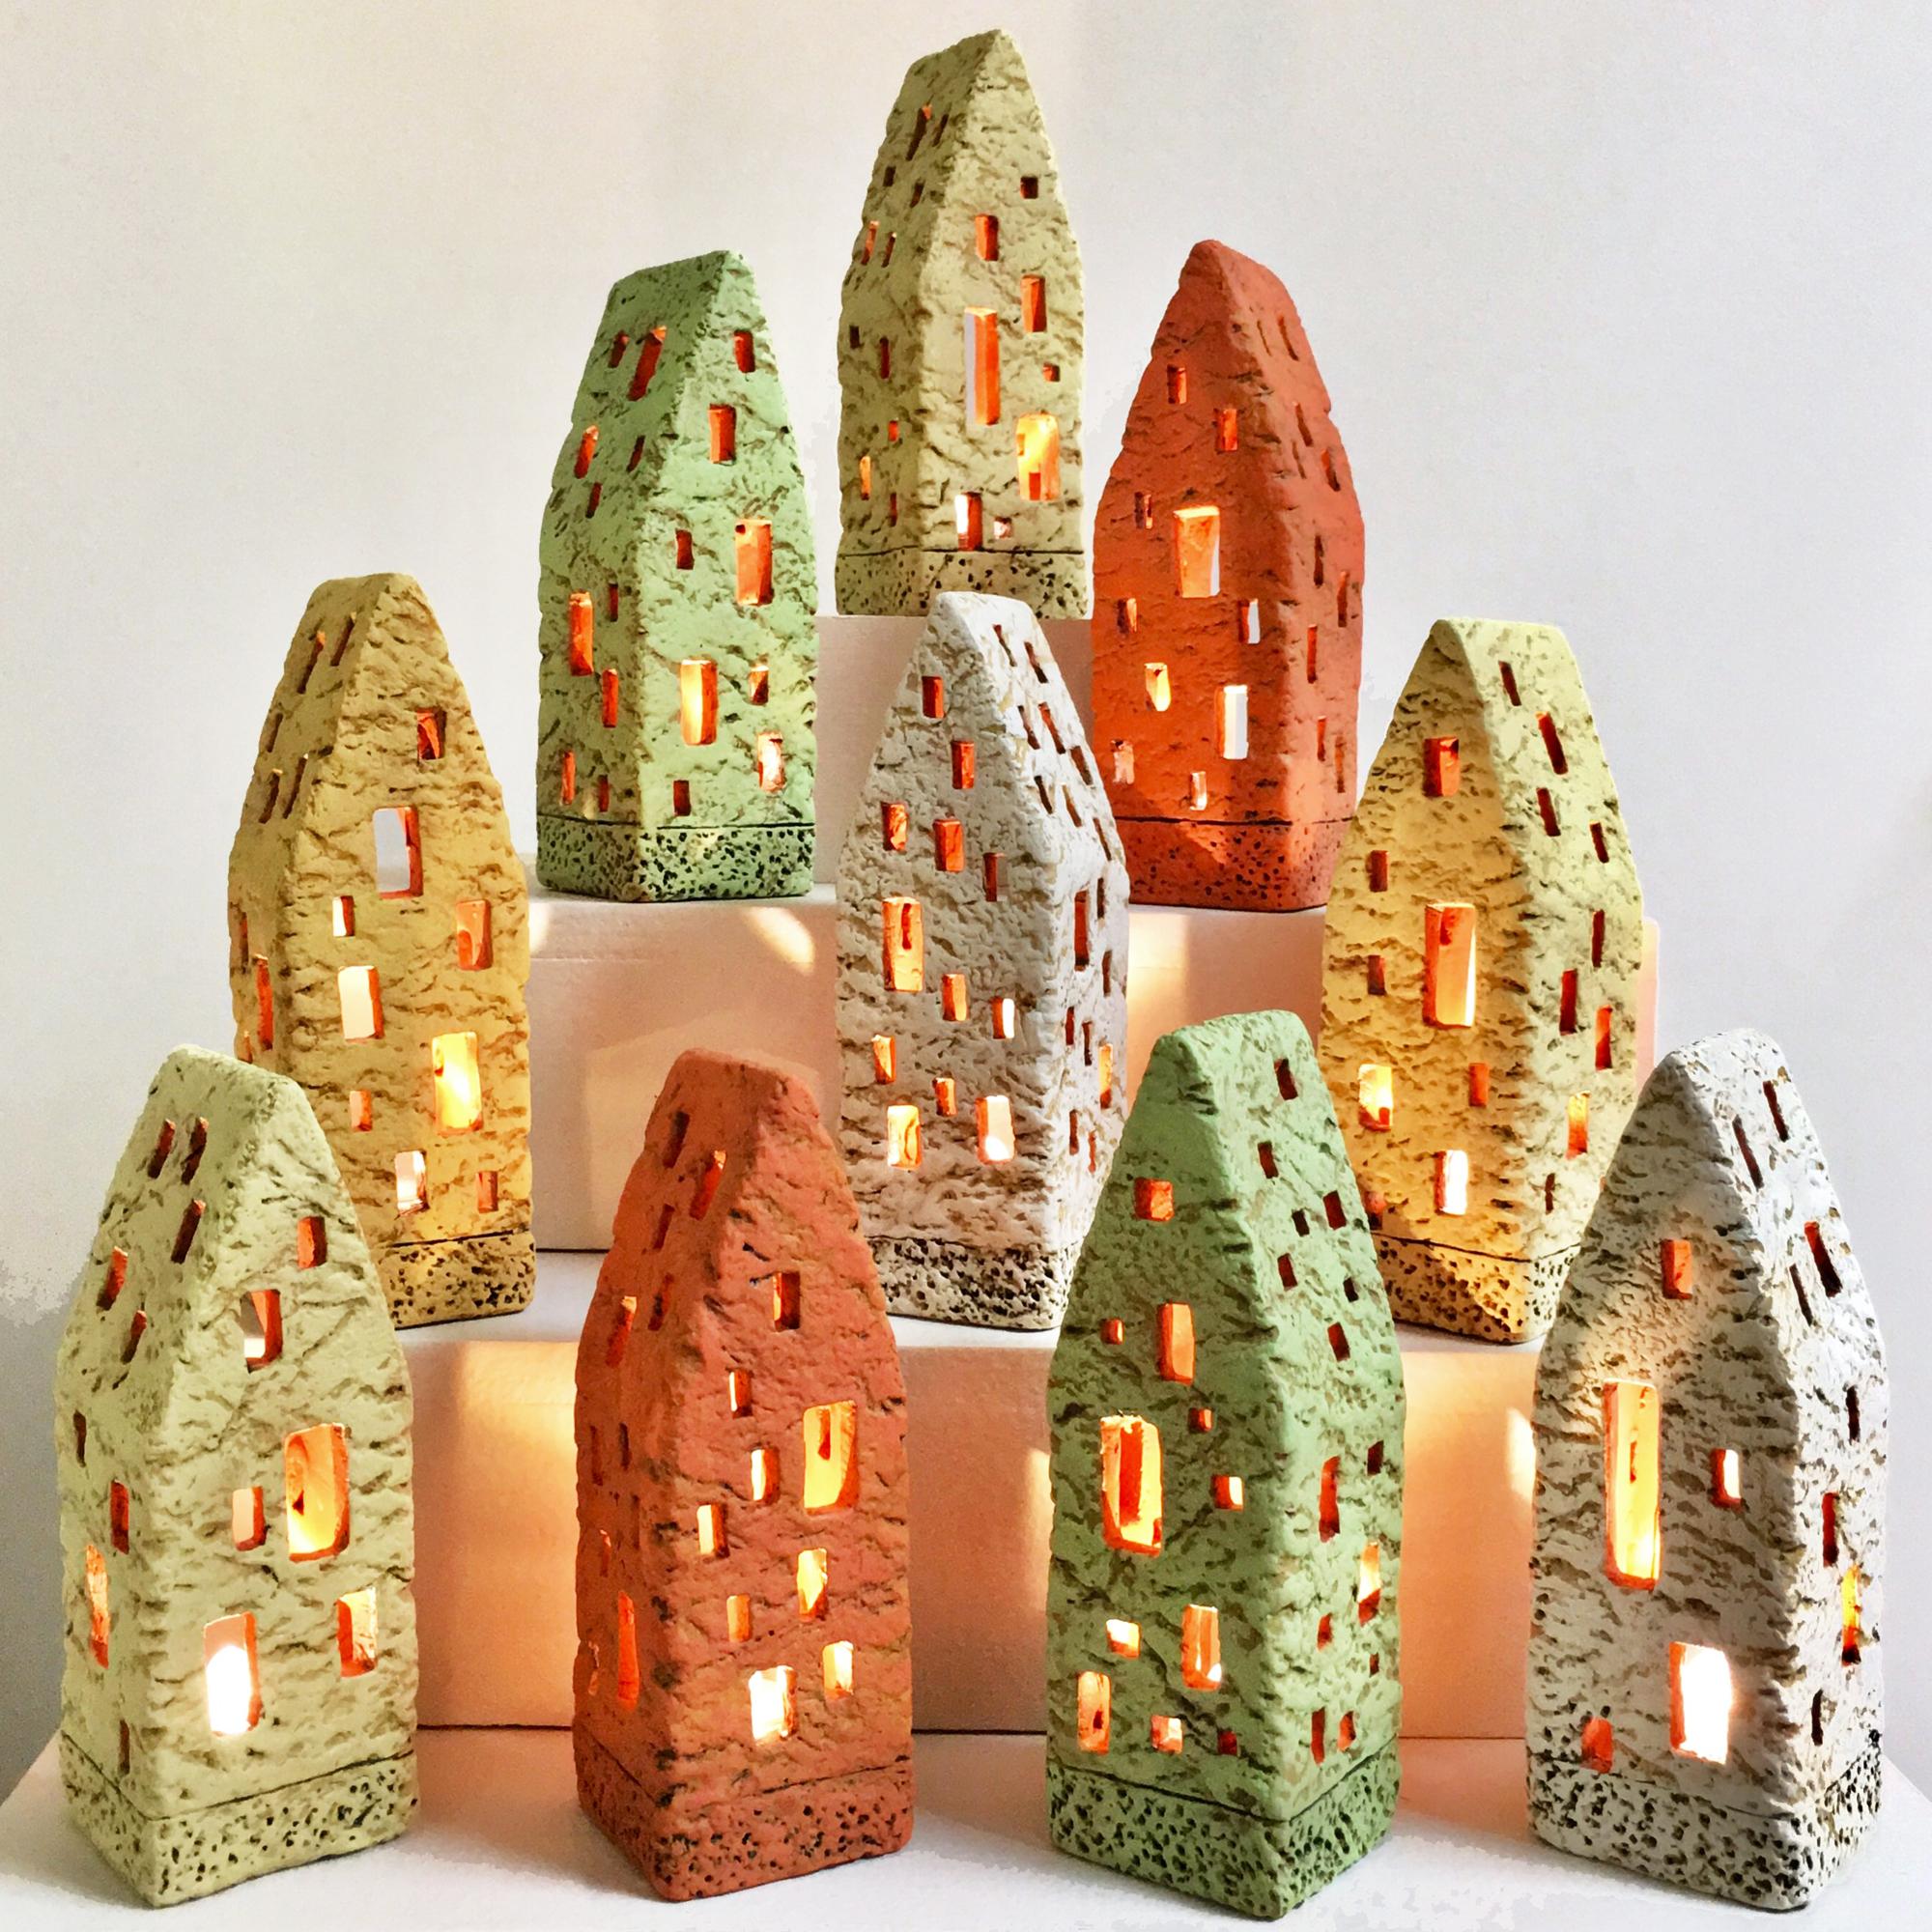 10 Houses of Light - Byers McCurry Studio.jpg